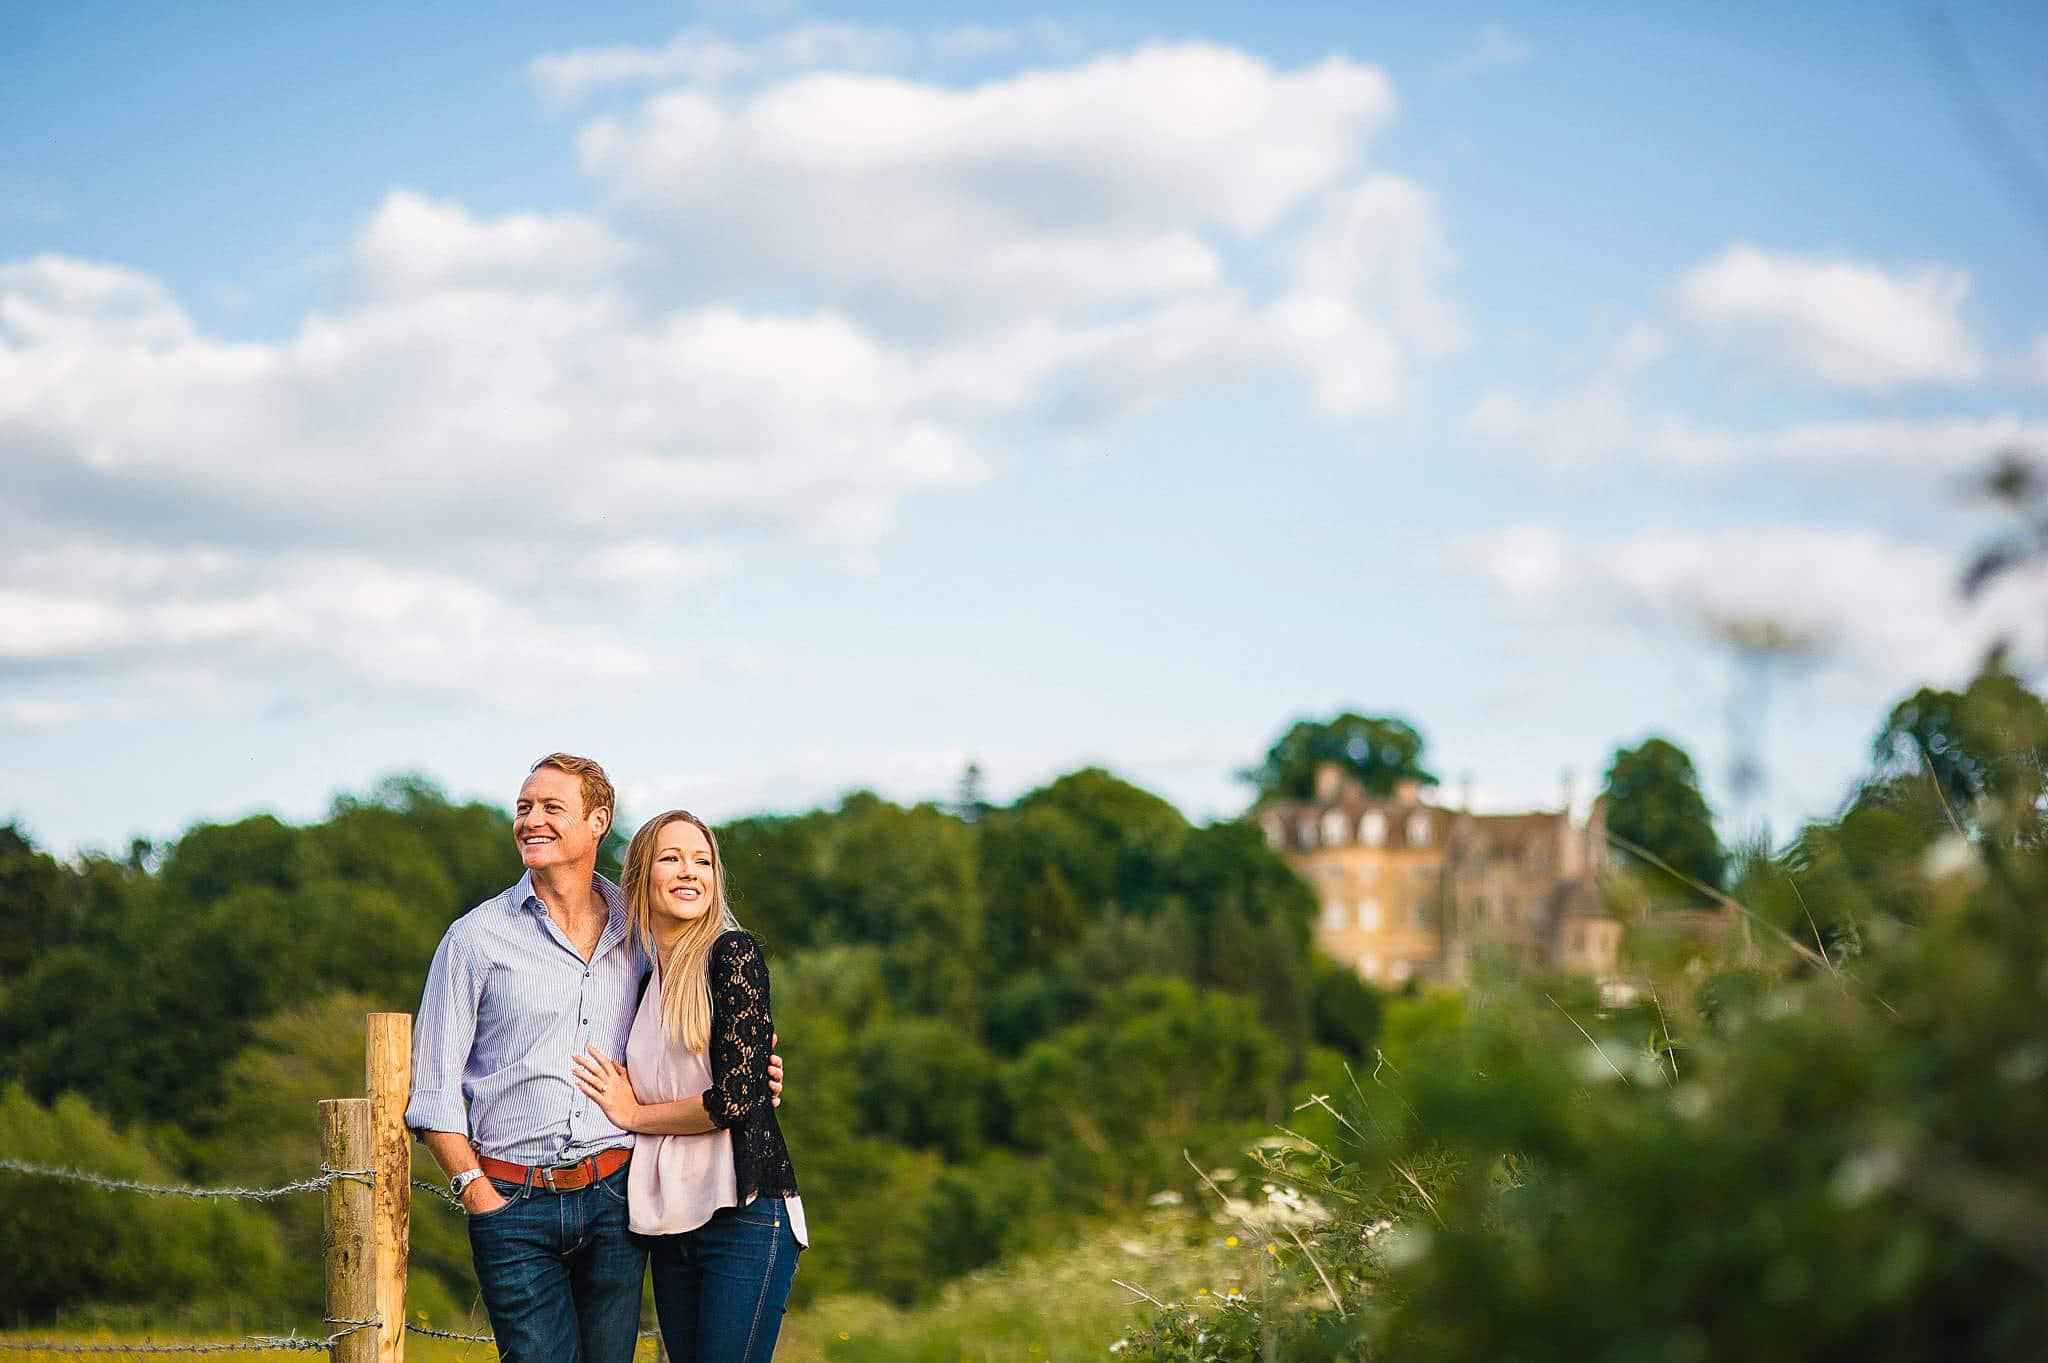 hereford-wedding-photographer (4)